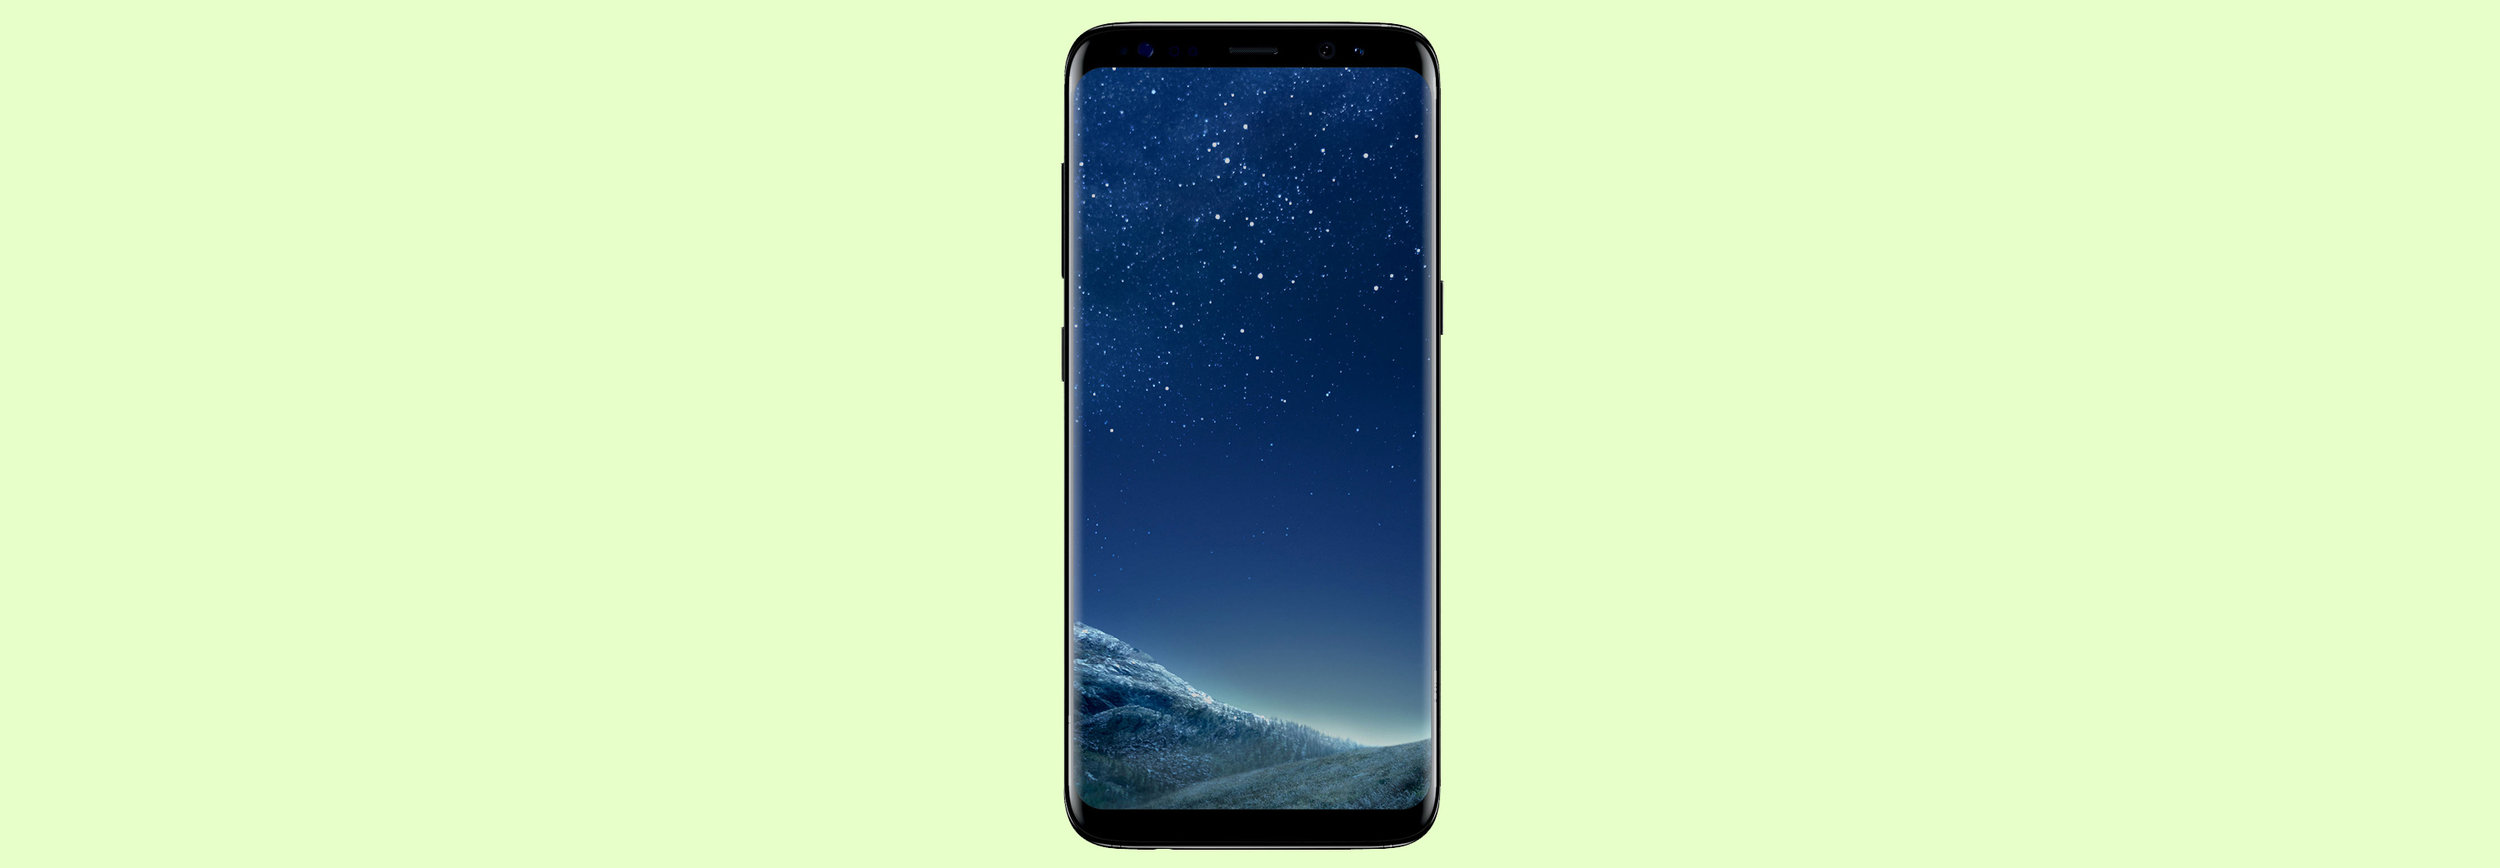 Galaxy S8 Plus Ex.jpg